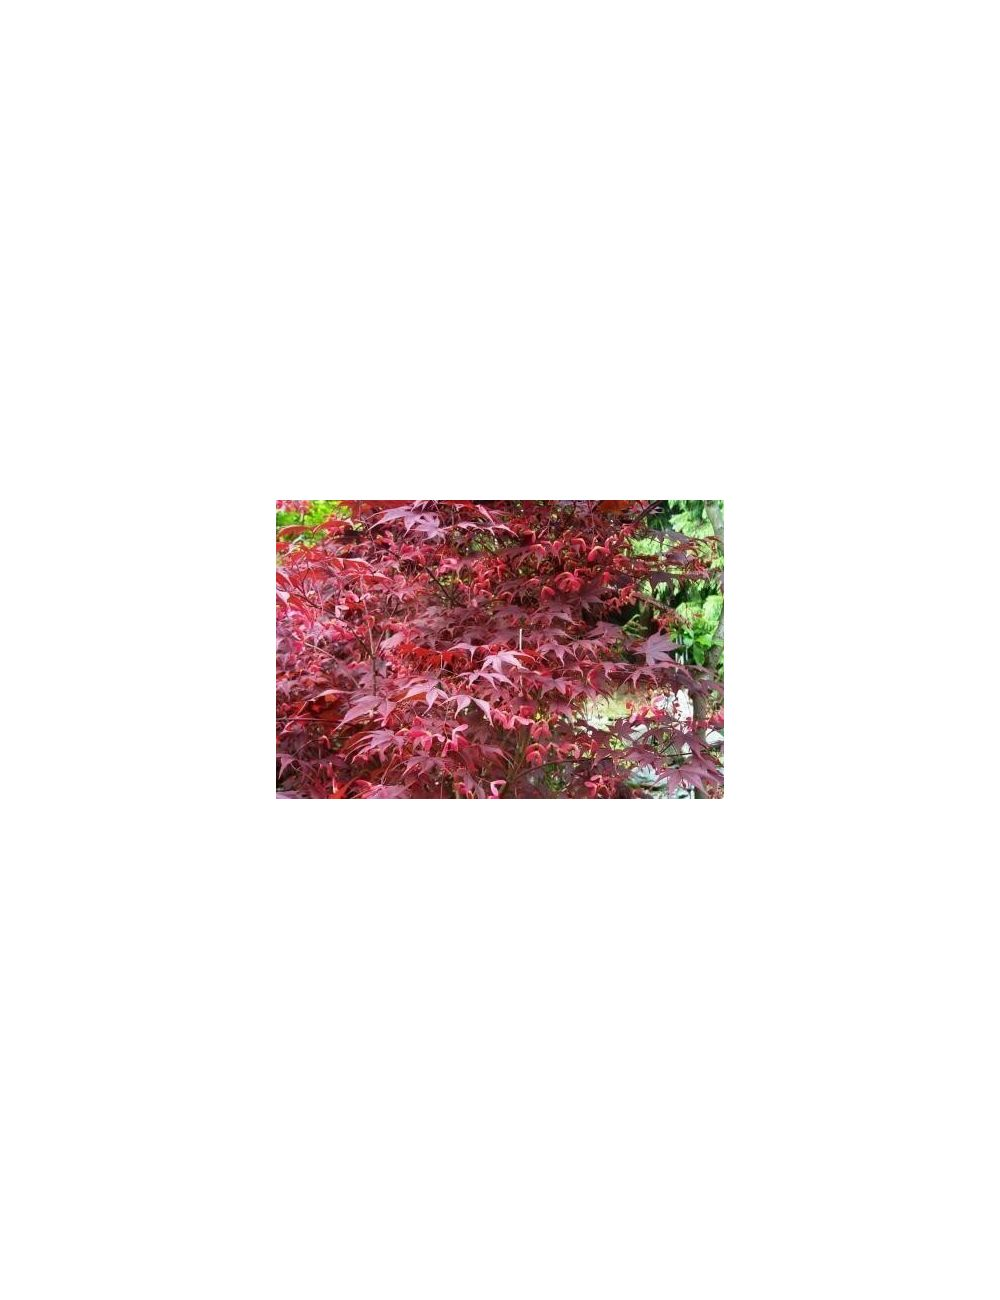 Acero giapponese fg1 vendita piante on line for Acero giapponese nano